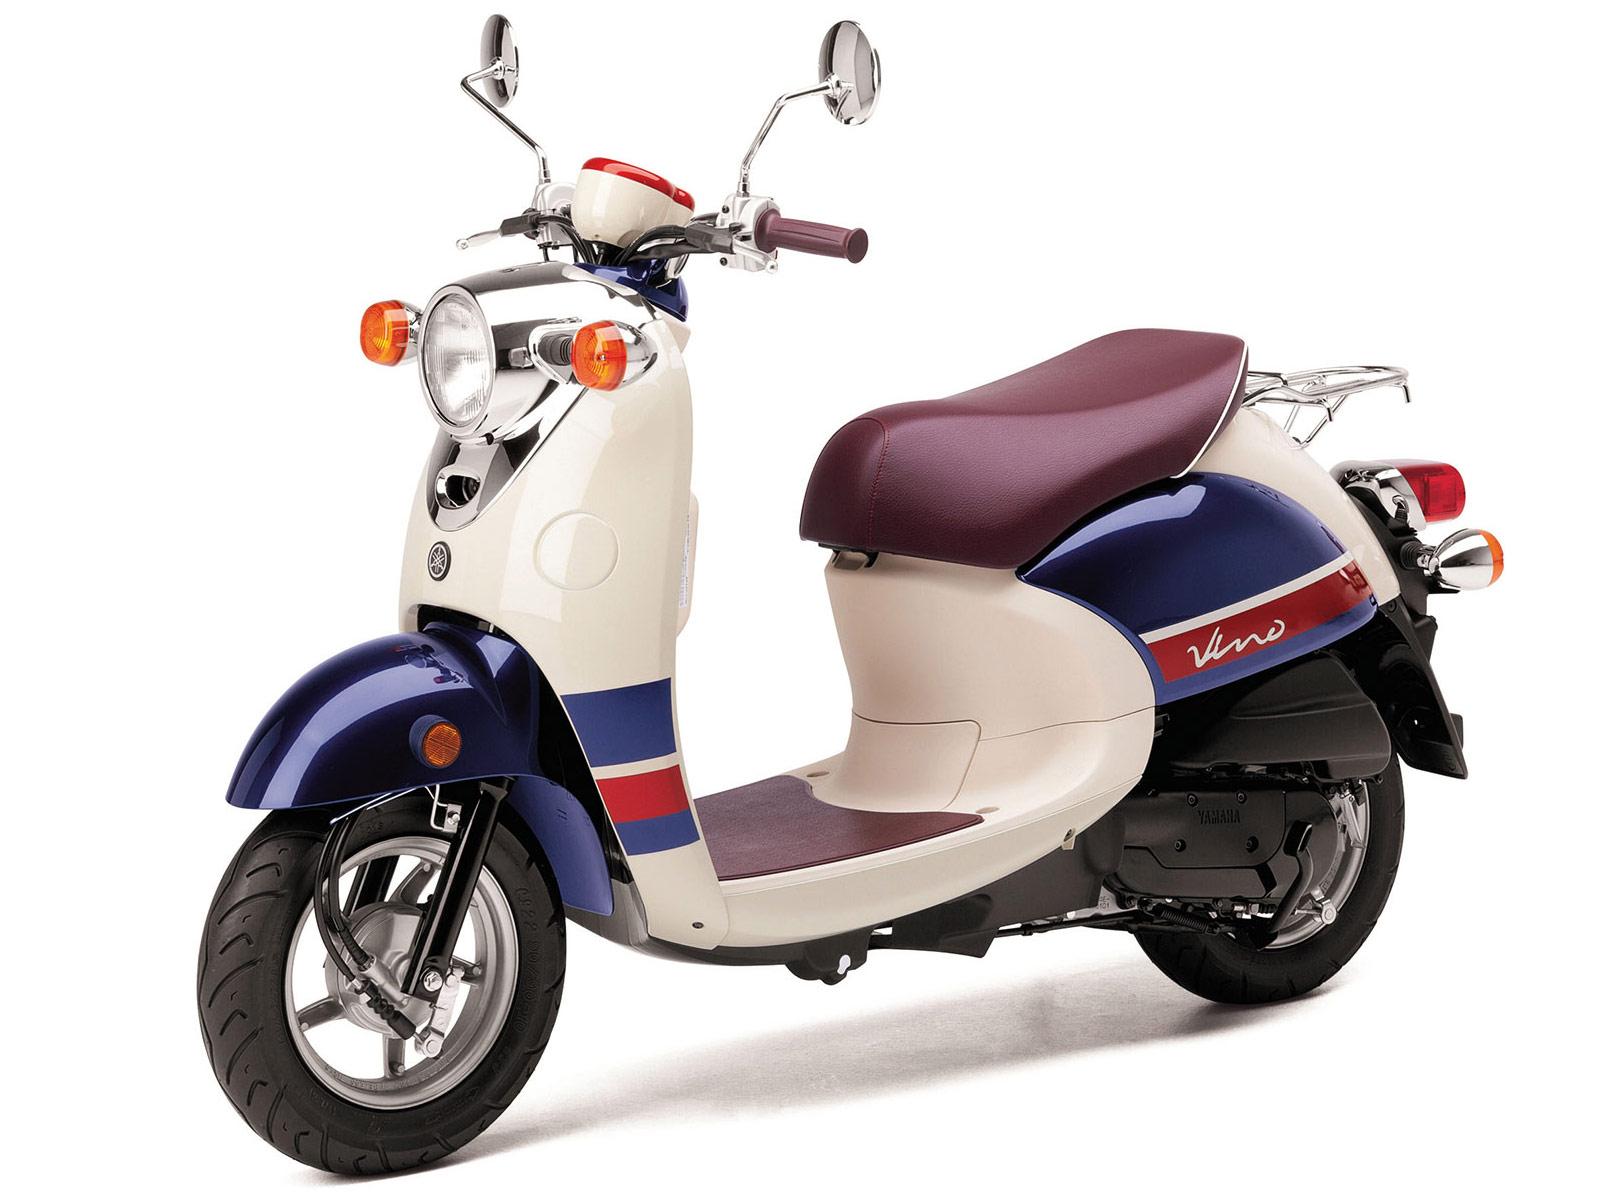 Vintage Yamaha Scooter